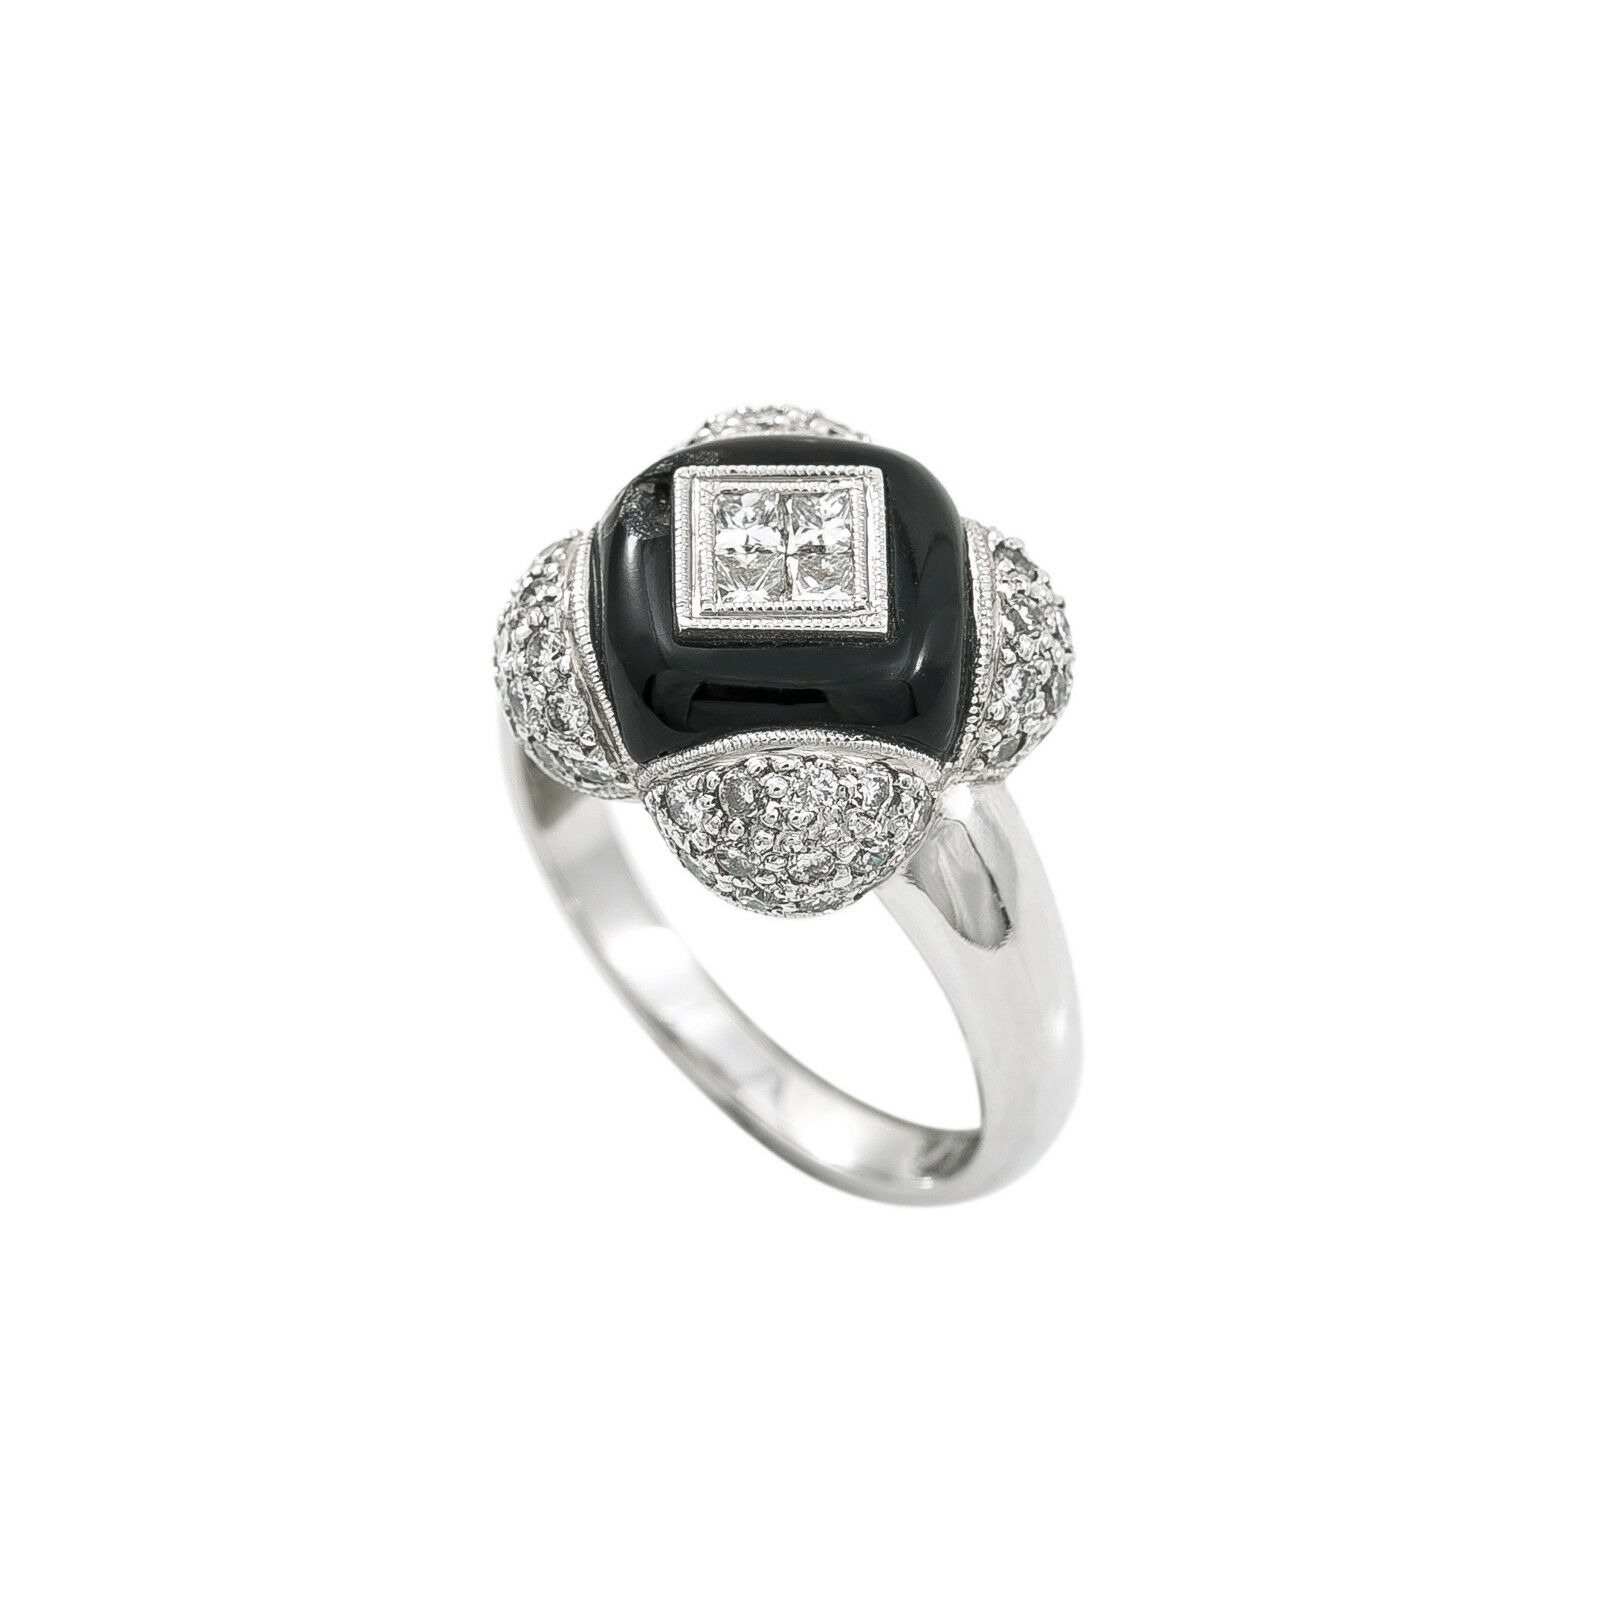 18K White gold 1Ct G VS1 Diamond Onyx Ring 7.8 Grams Ring Size 7.25